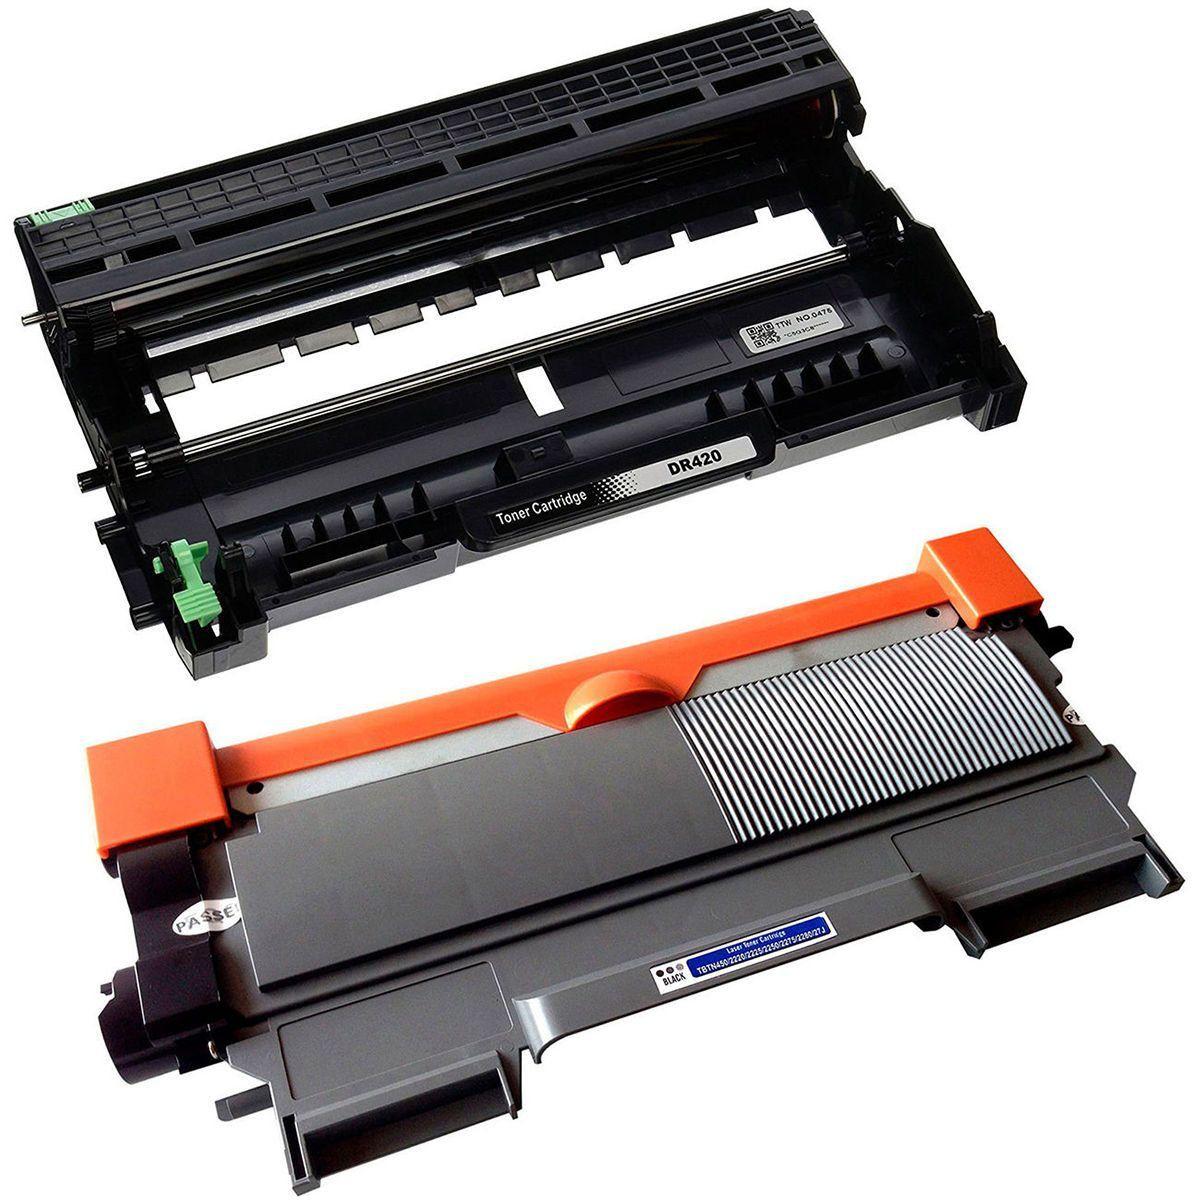 Compatível: Combo Fotocondutor DR420 + Toner TN450 TN420 TN410 para Brother DCP7065dn DCP7060 HL2270 DCP7055 MFC7860